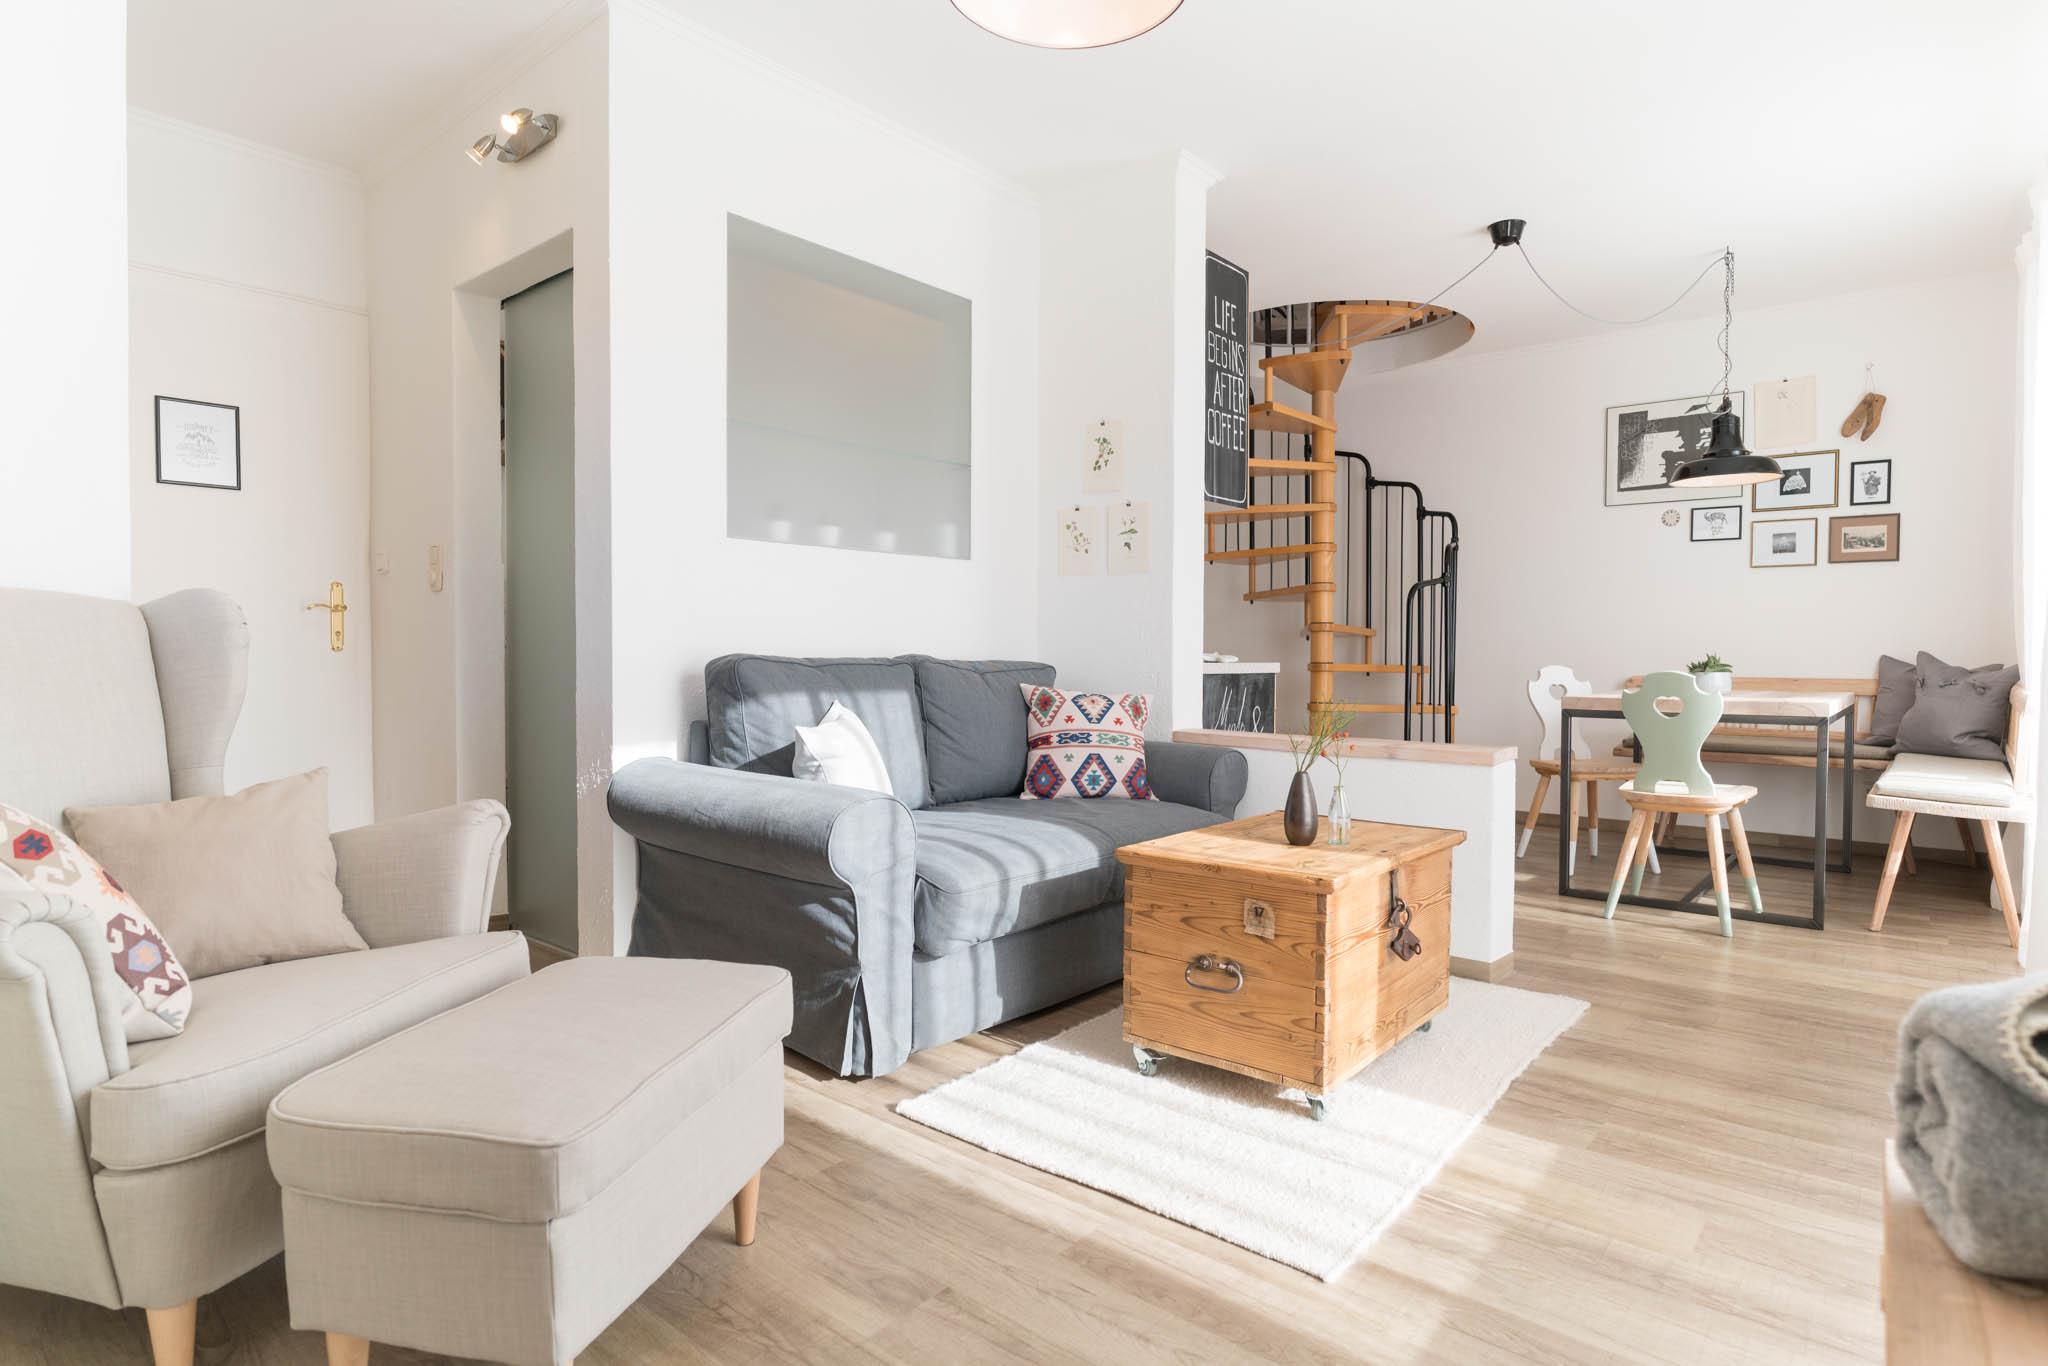 laerchmoos_appartement-c-1